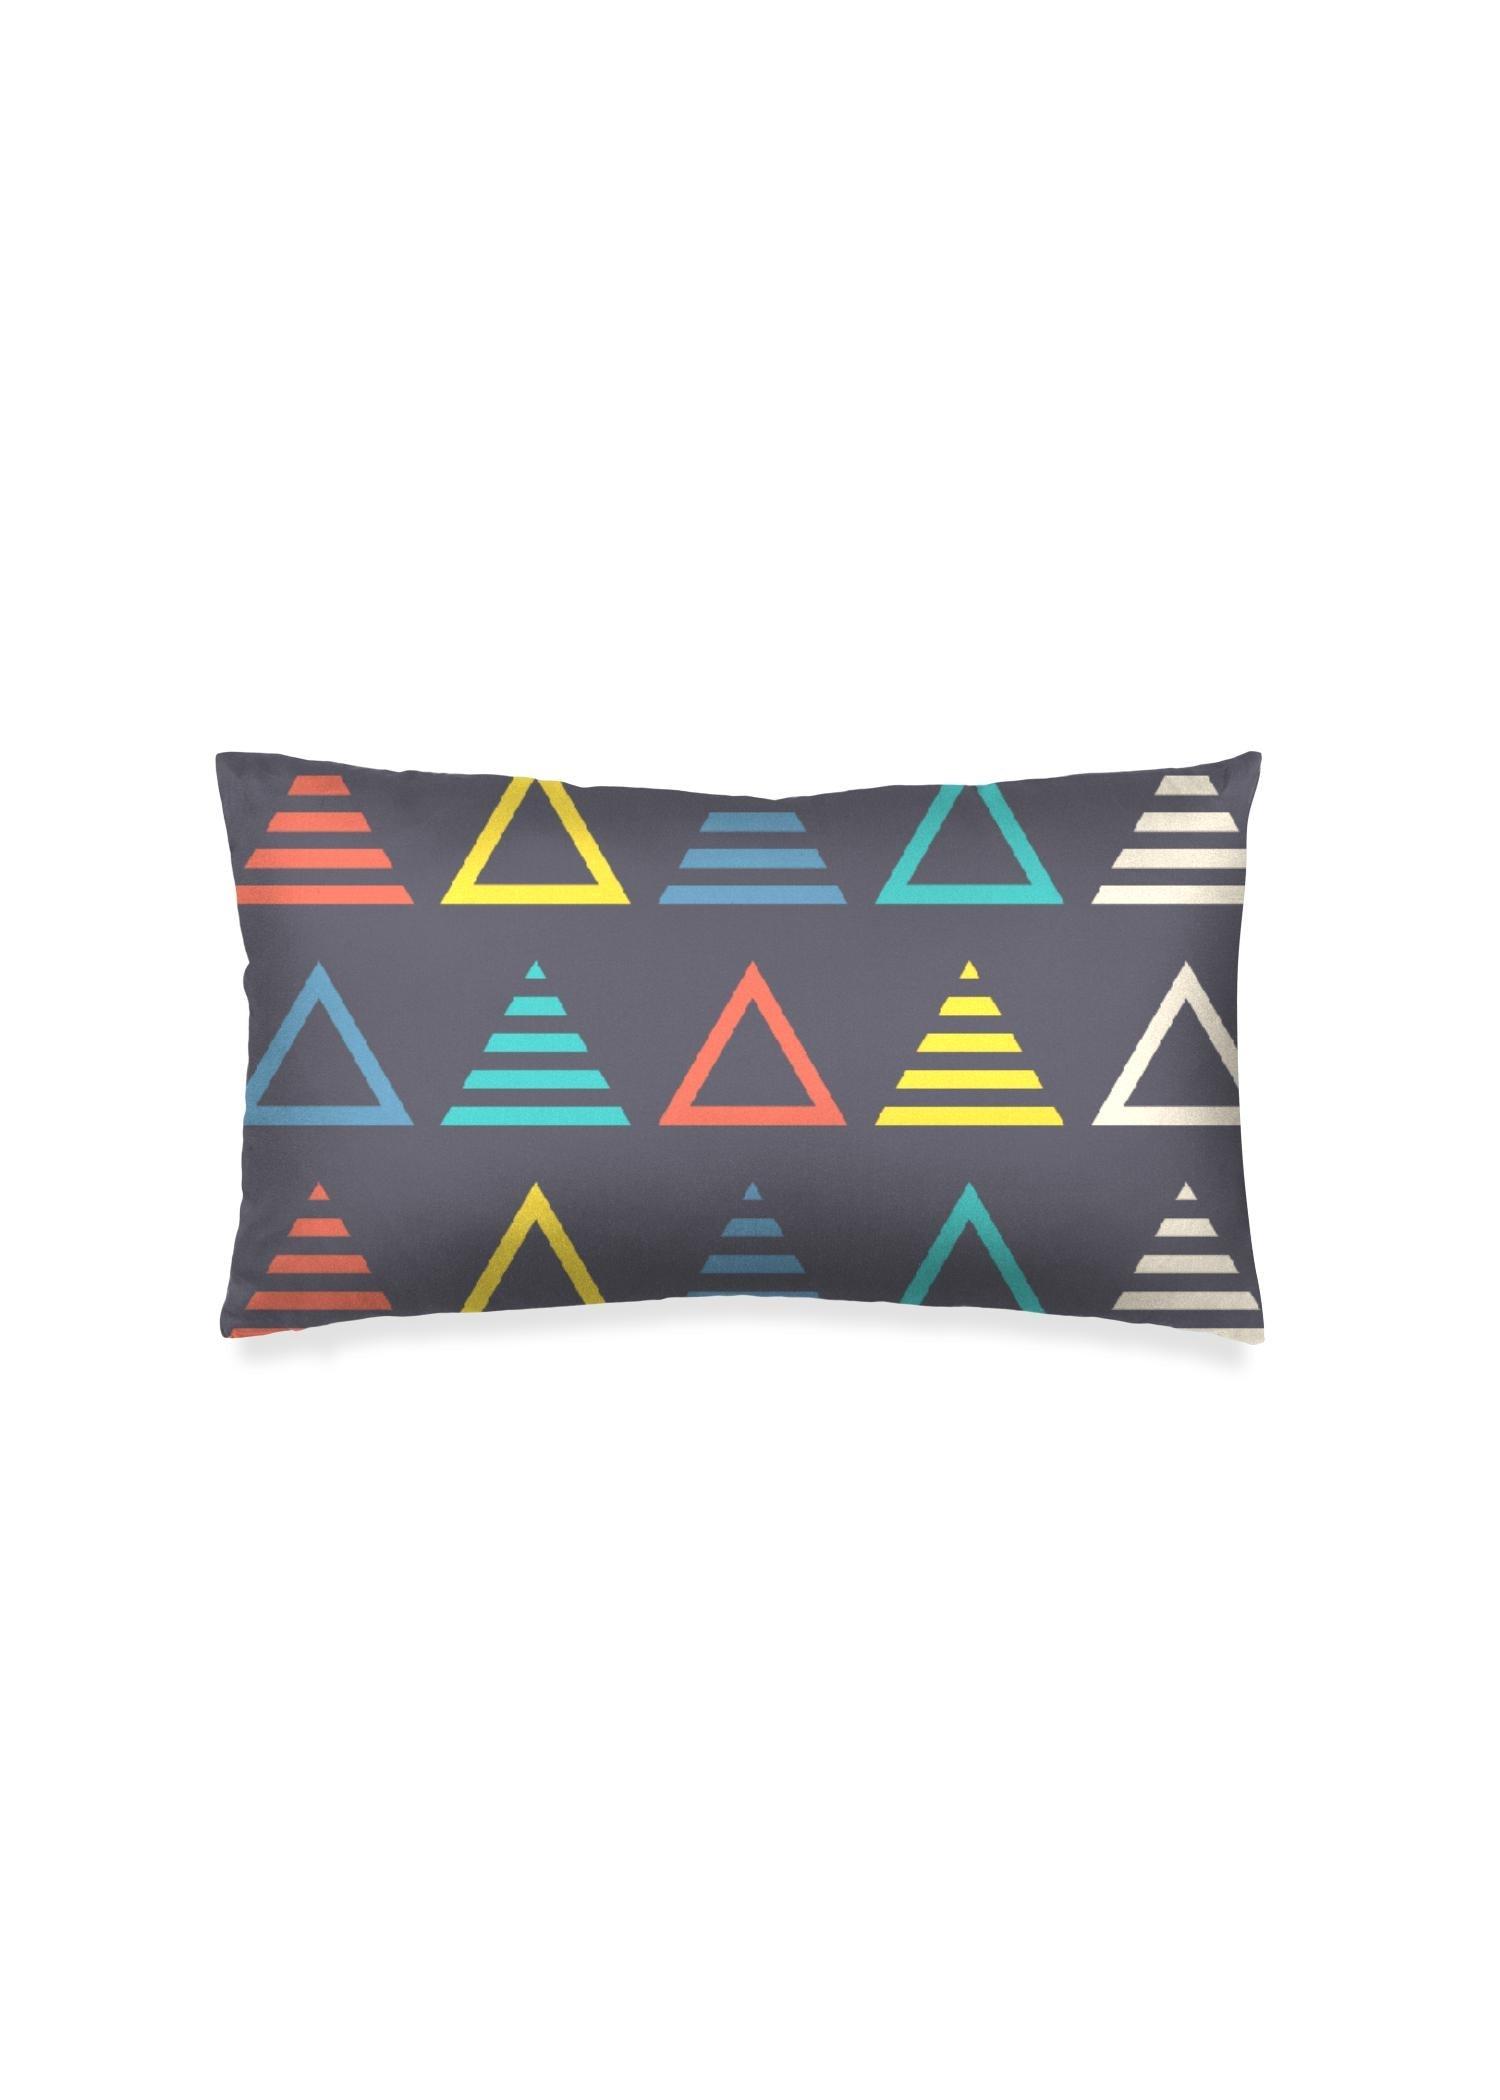 VIDA Oblong Pillow - Music Symmetric Triangle by VIDA Original Artist  - Size: Matte